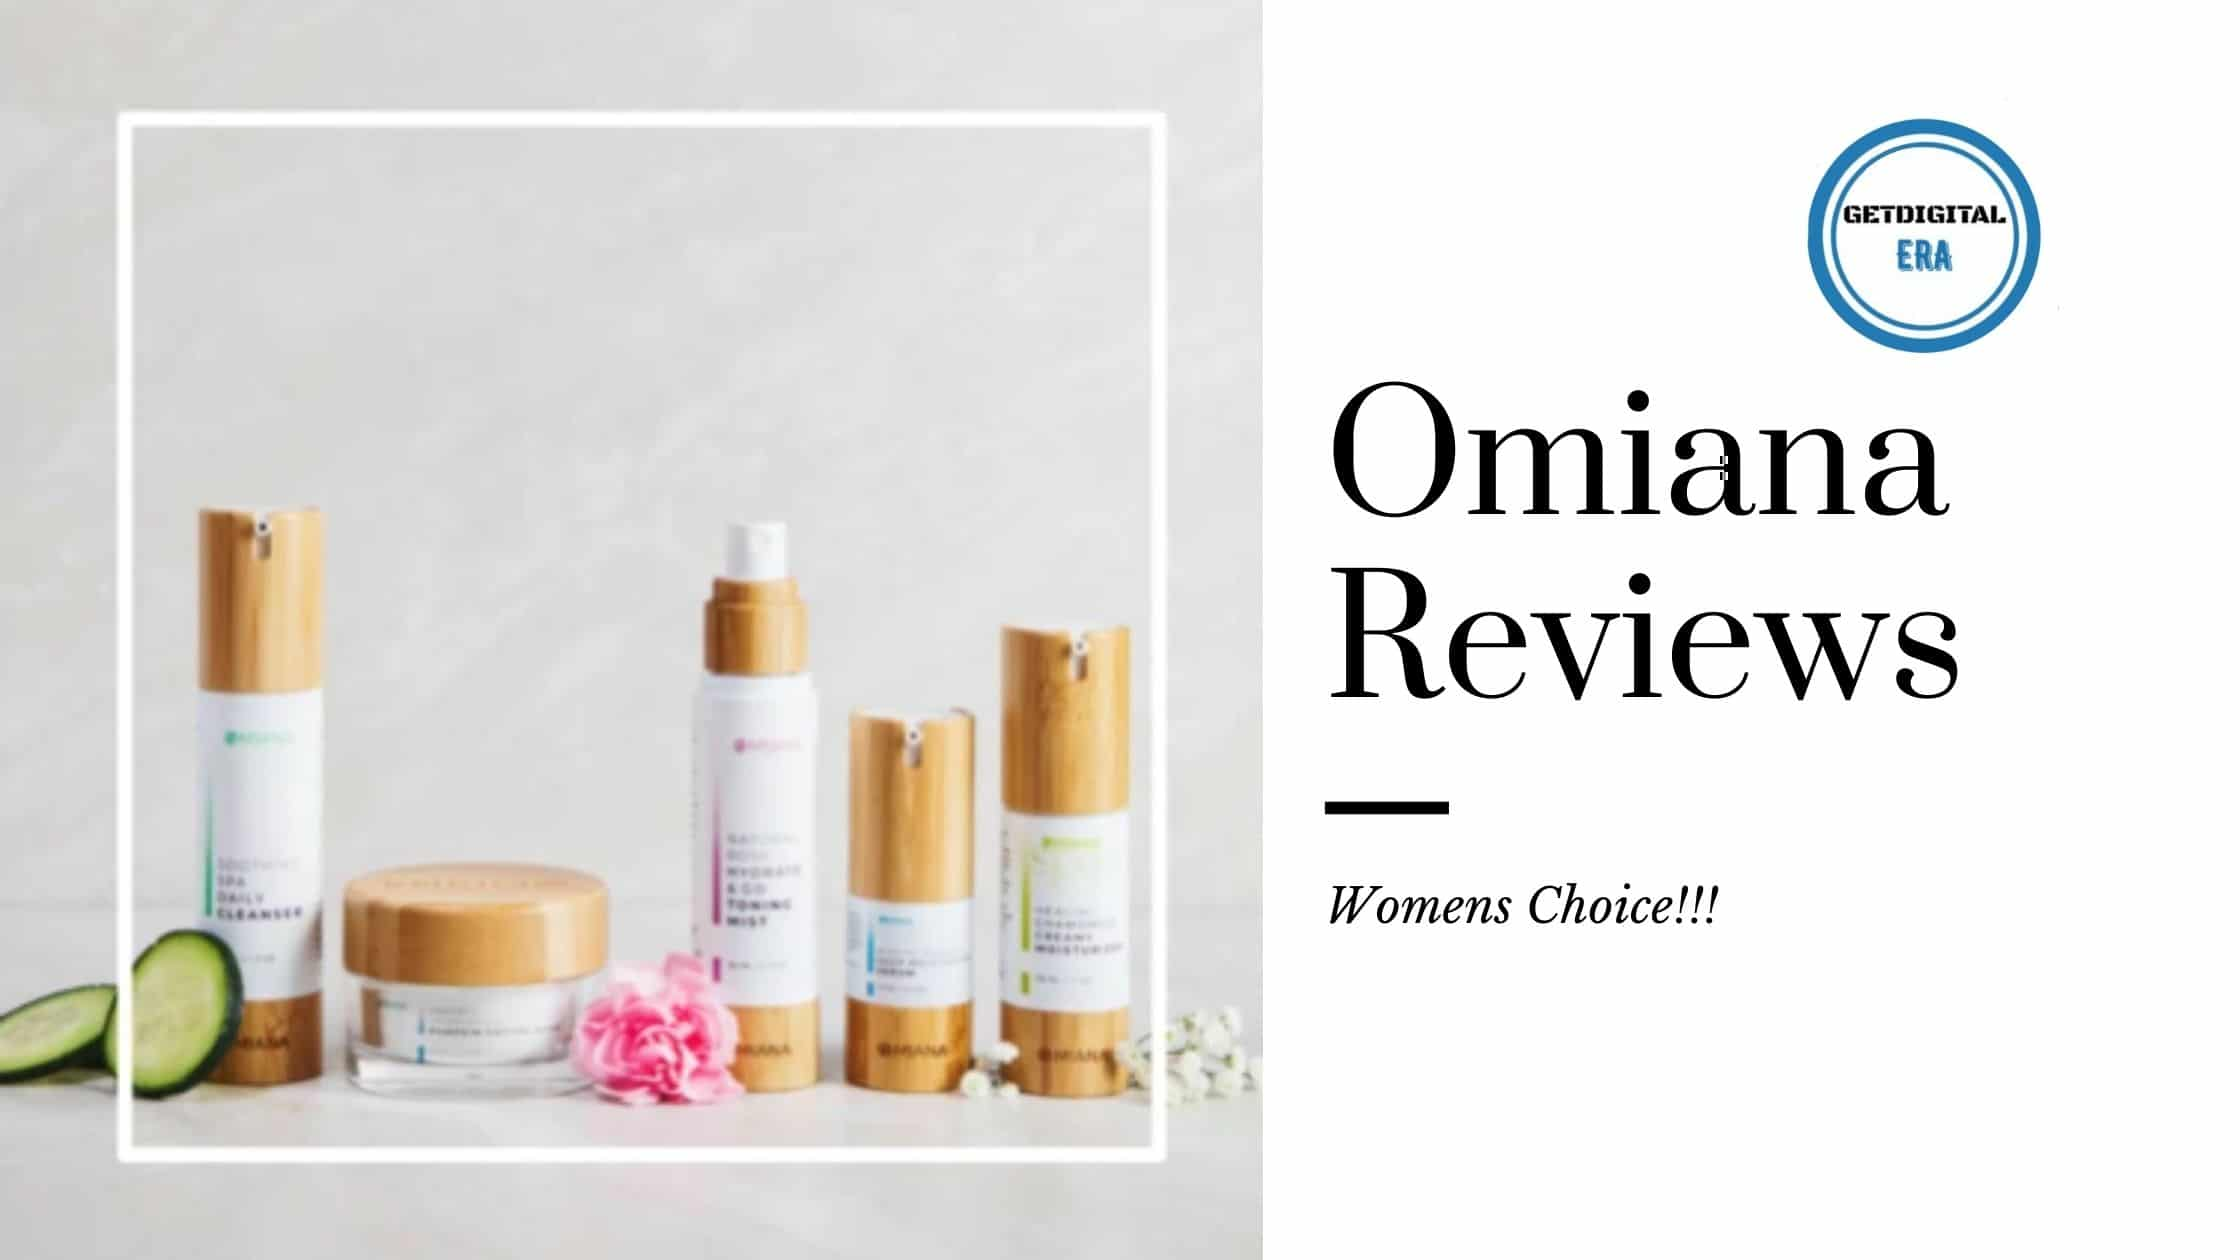 Omiana Reviews